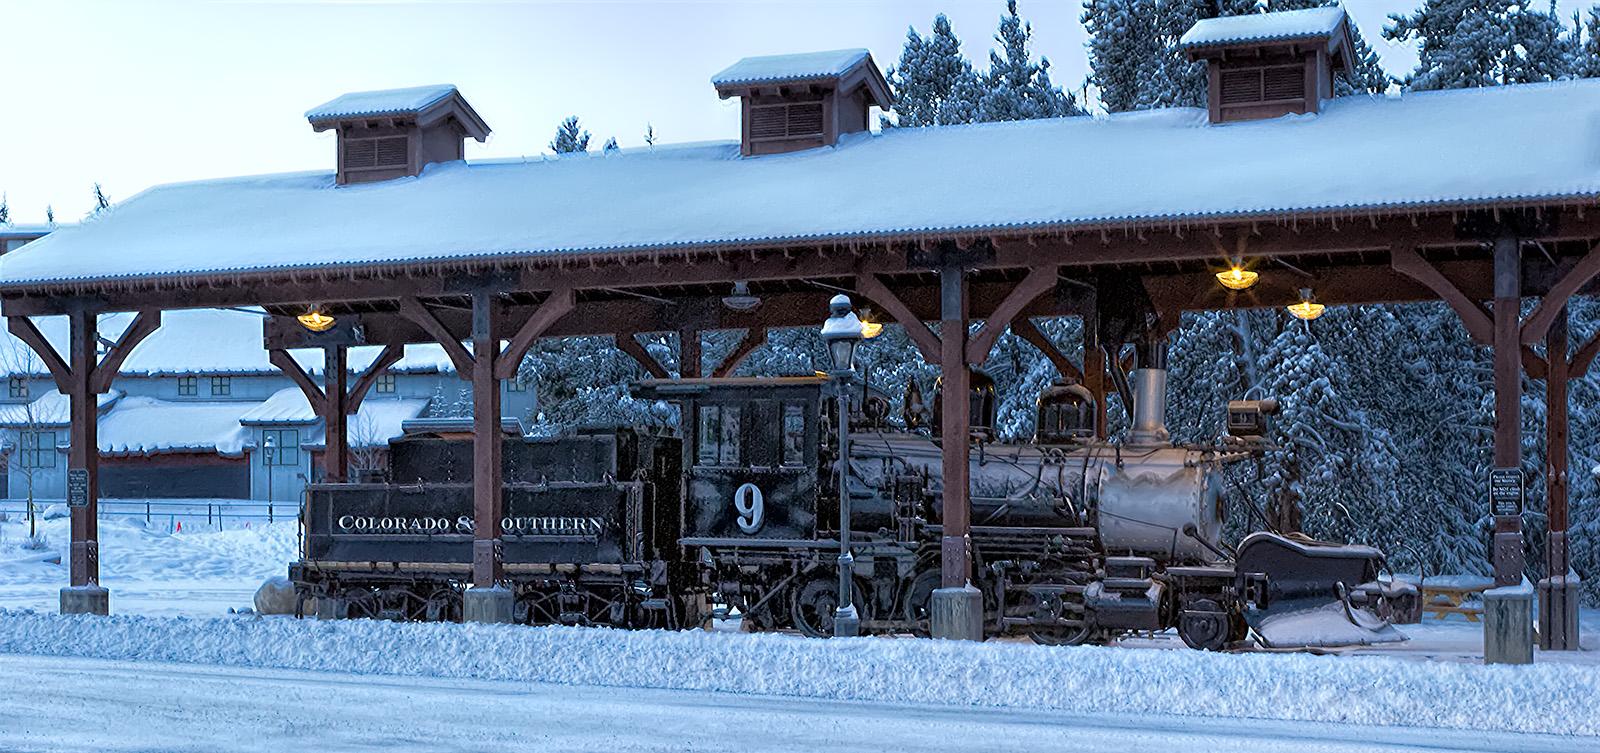 Breckenridge Colorado Steam Engine